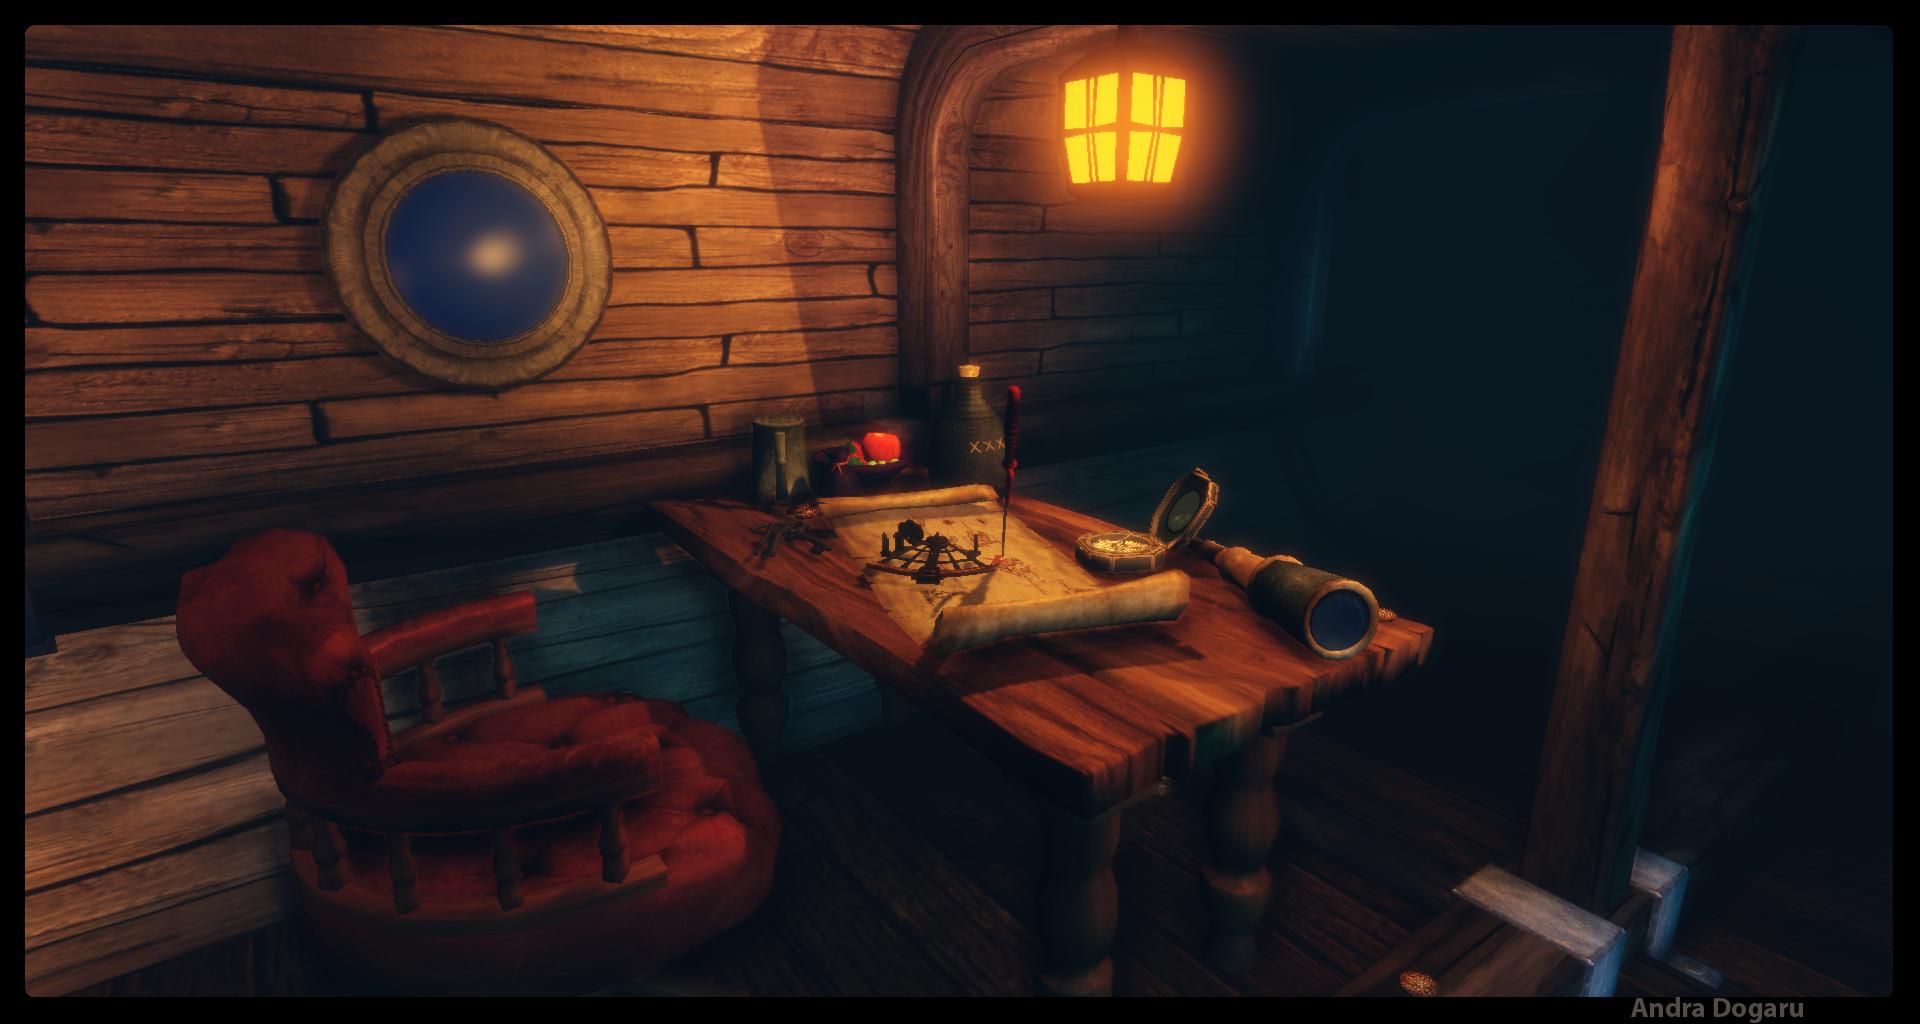 pirate ship interior image google search dining room pirates rh pinterest com